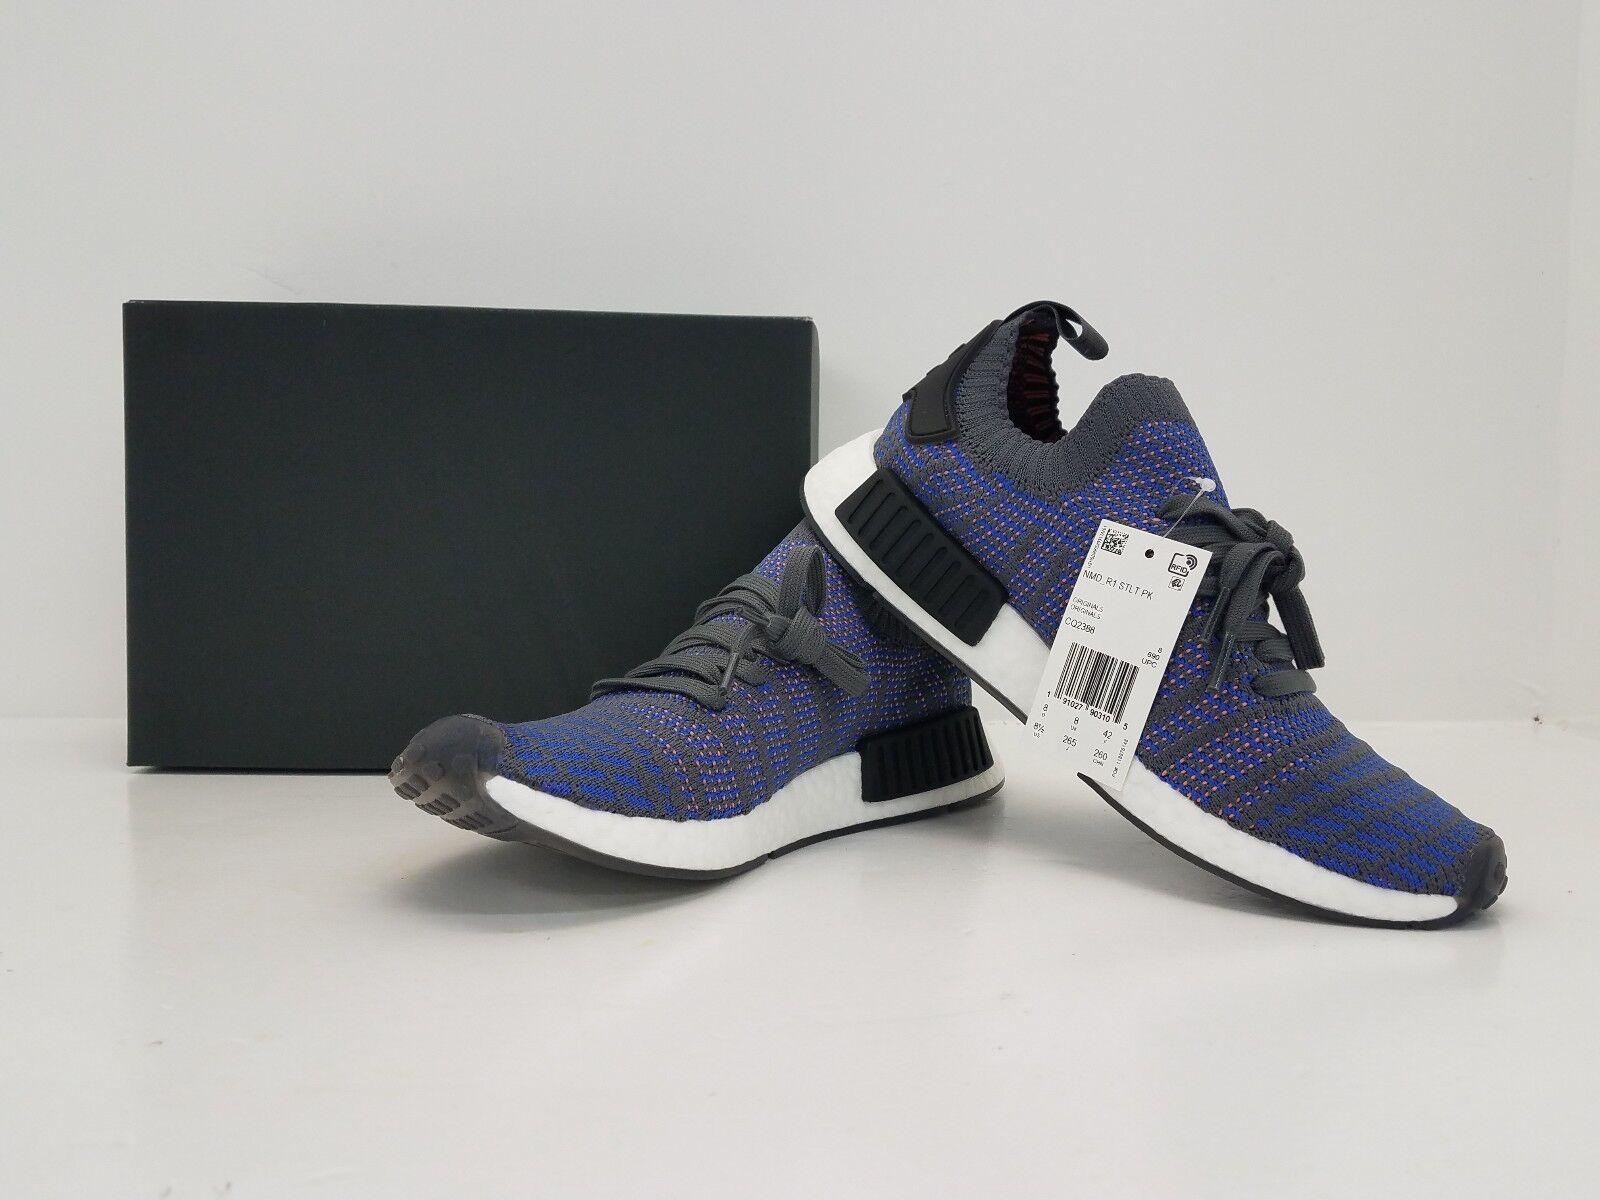 Adidas nmd_r1 stlt PK Nomad / primeknit Azul / BLK / Nomad coral cq2388 - brand Nuevo in box! 87f015